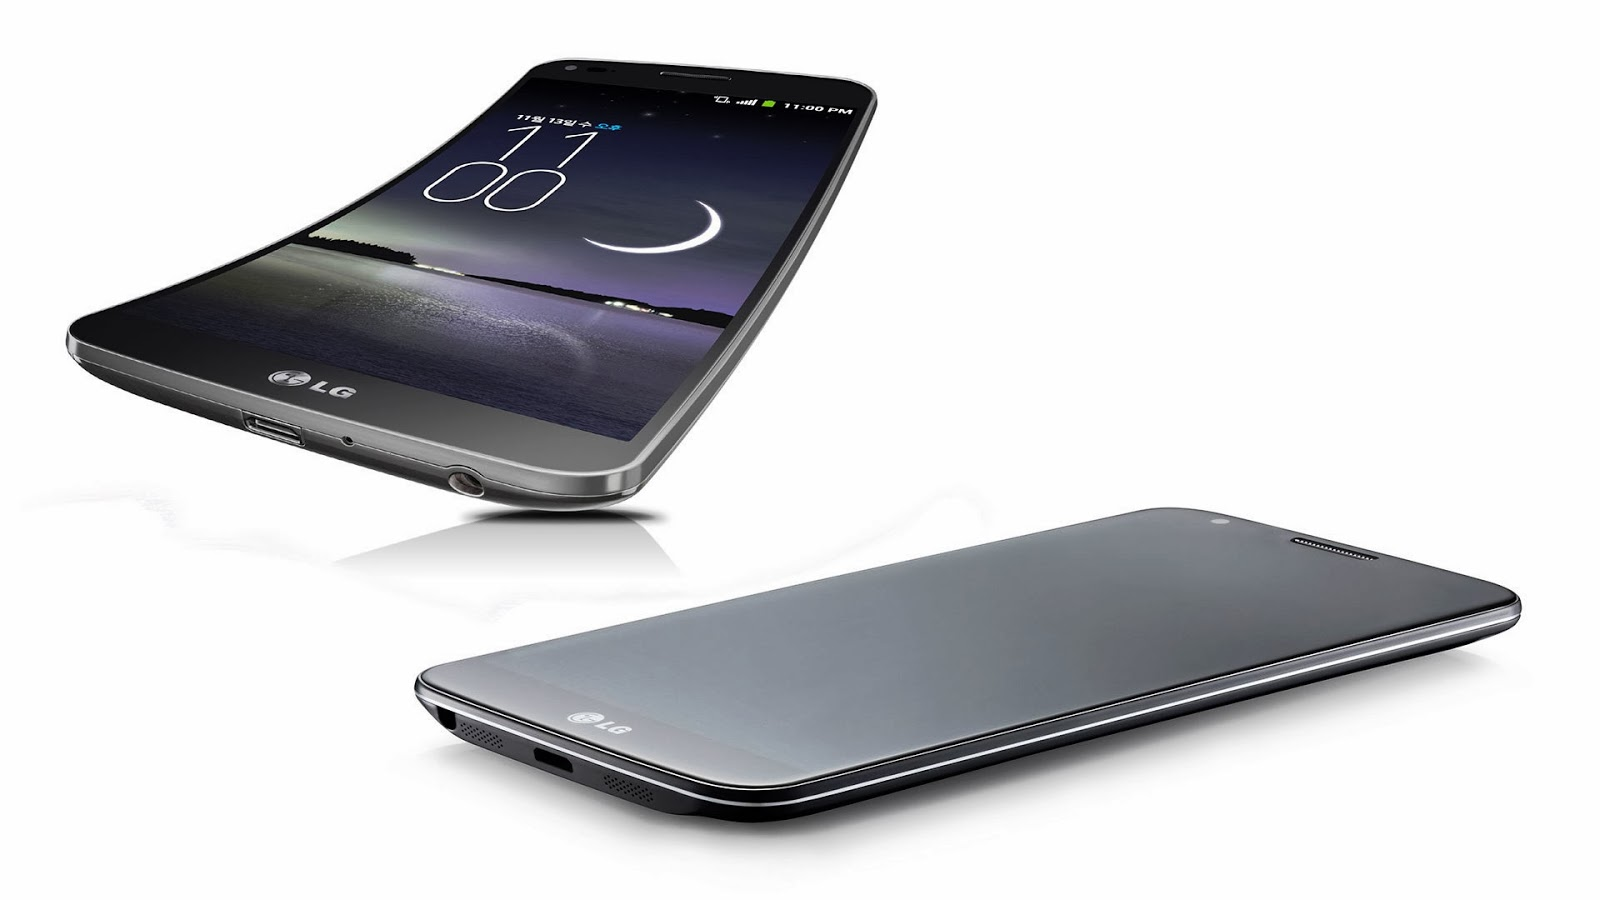 LG G Flex Smartphone specifications